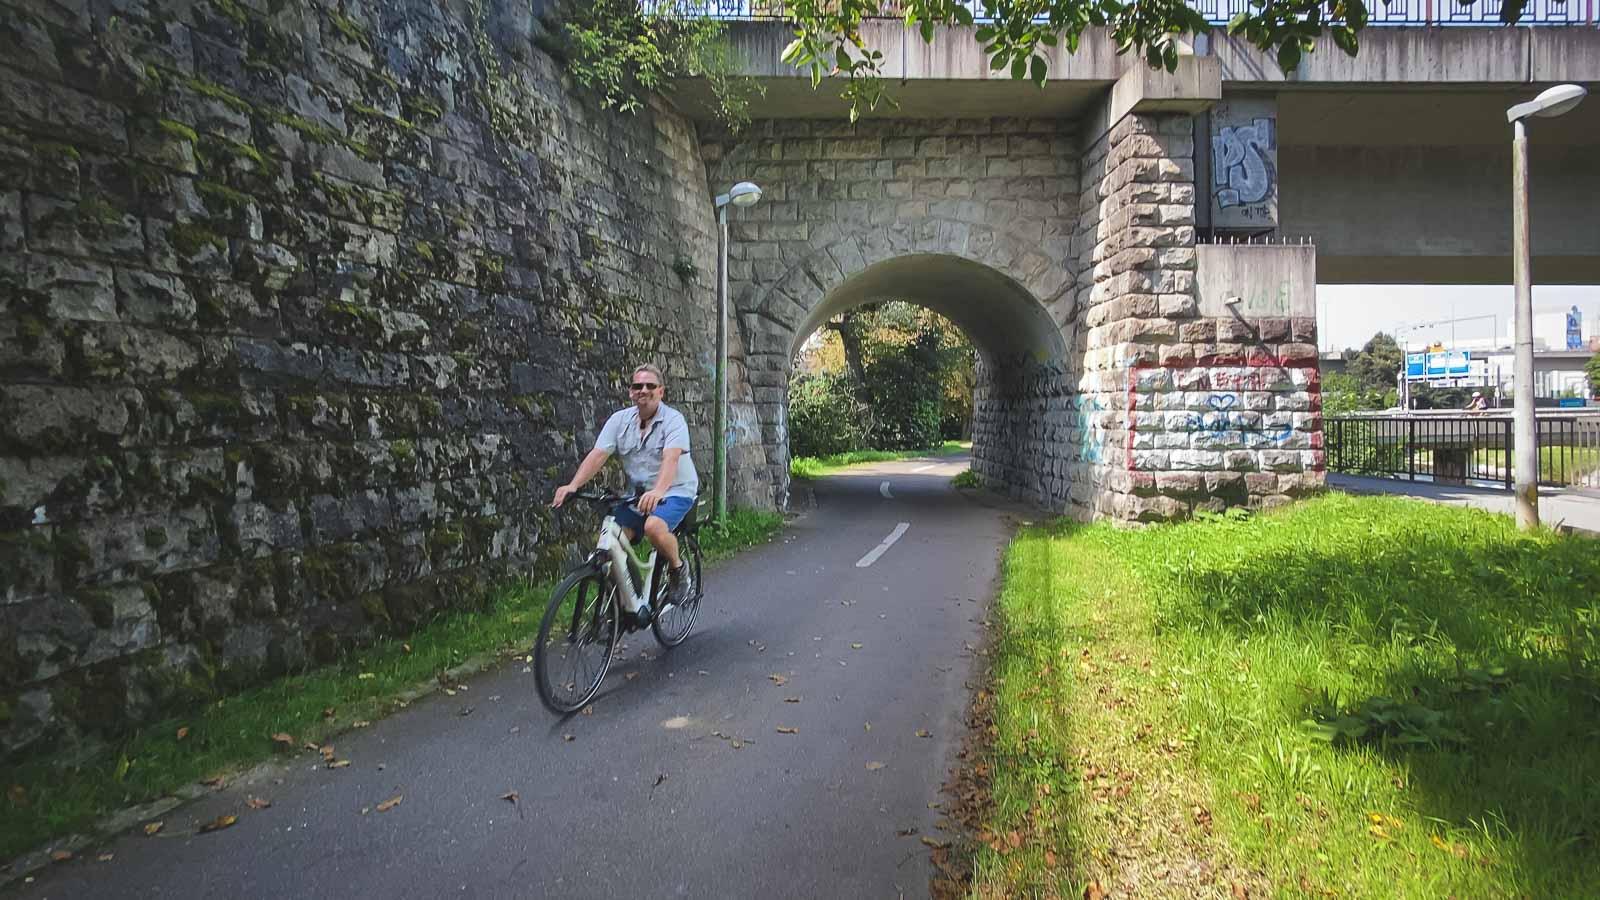 Cycling the Rehberger Weg in Basel